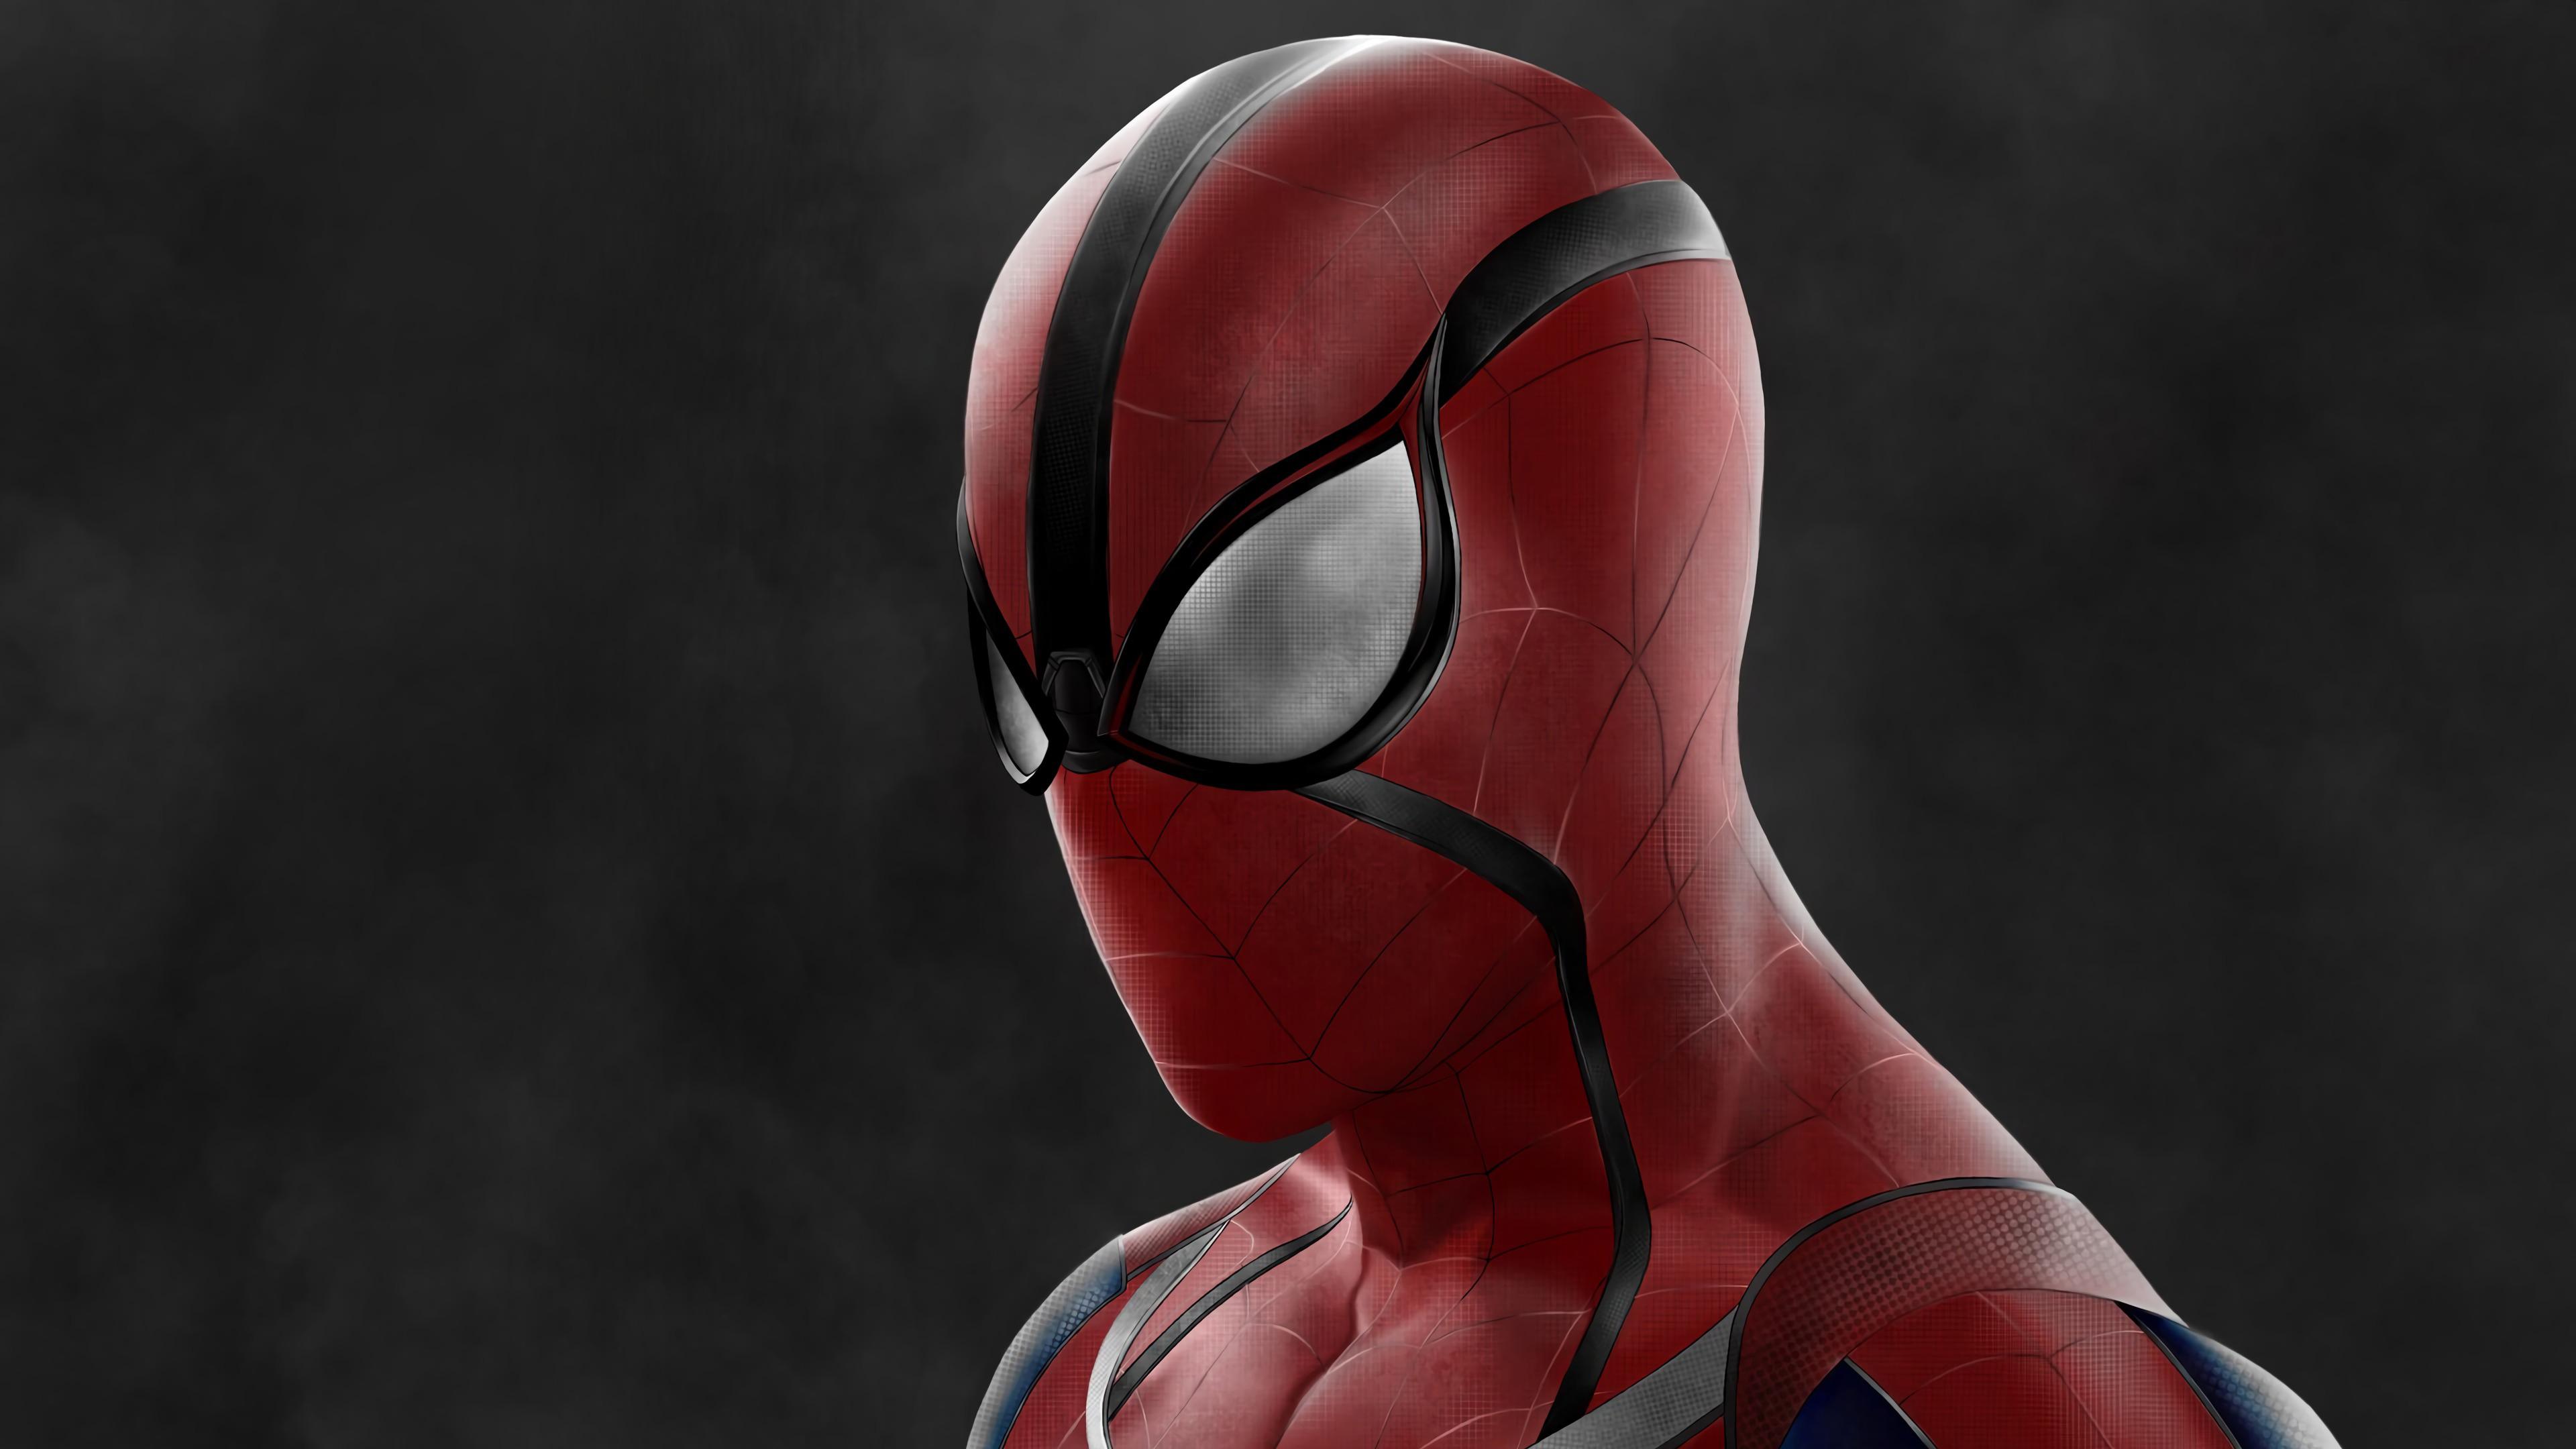 spiderman new 2019 1568054856 - Spiderman New 2019 - superheroes wallpapers, spiderman wallpapers, hd-wallpapers, digital art wallpapers, artwork wallpapers, artstation wallpapers, art wallpapers, 4k-wallpapers